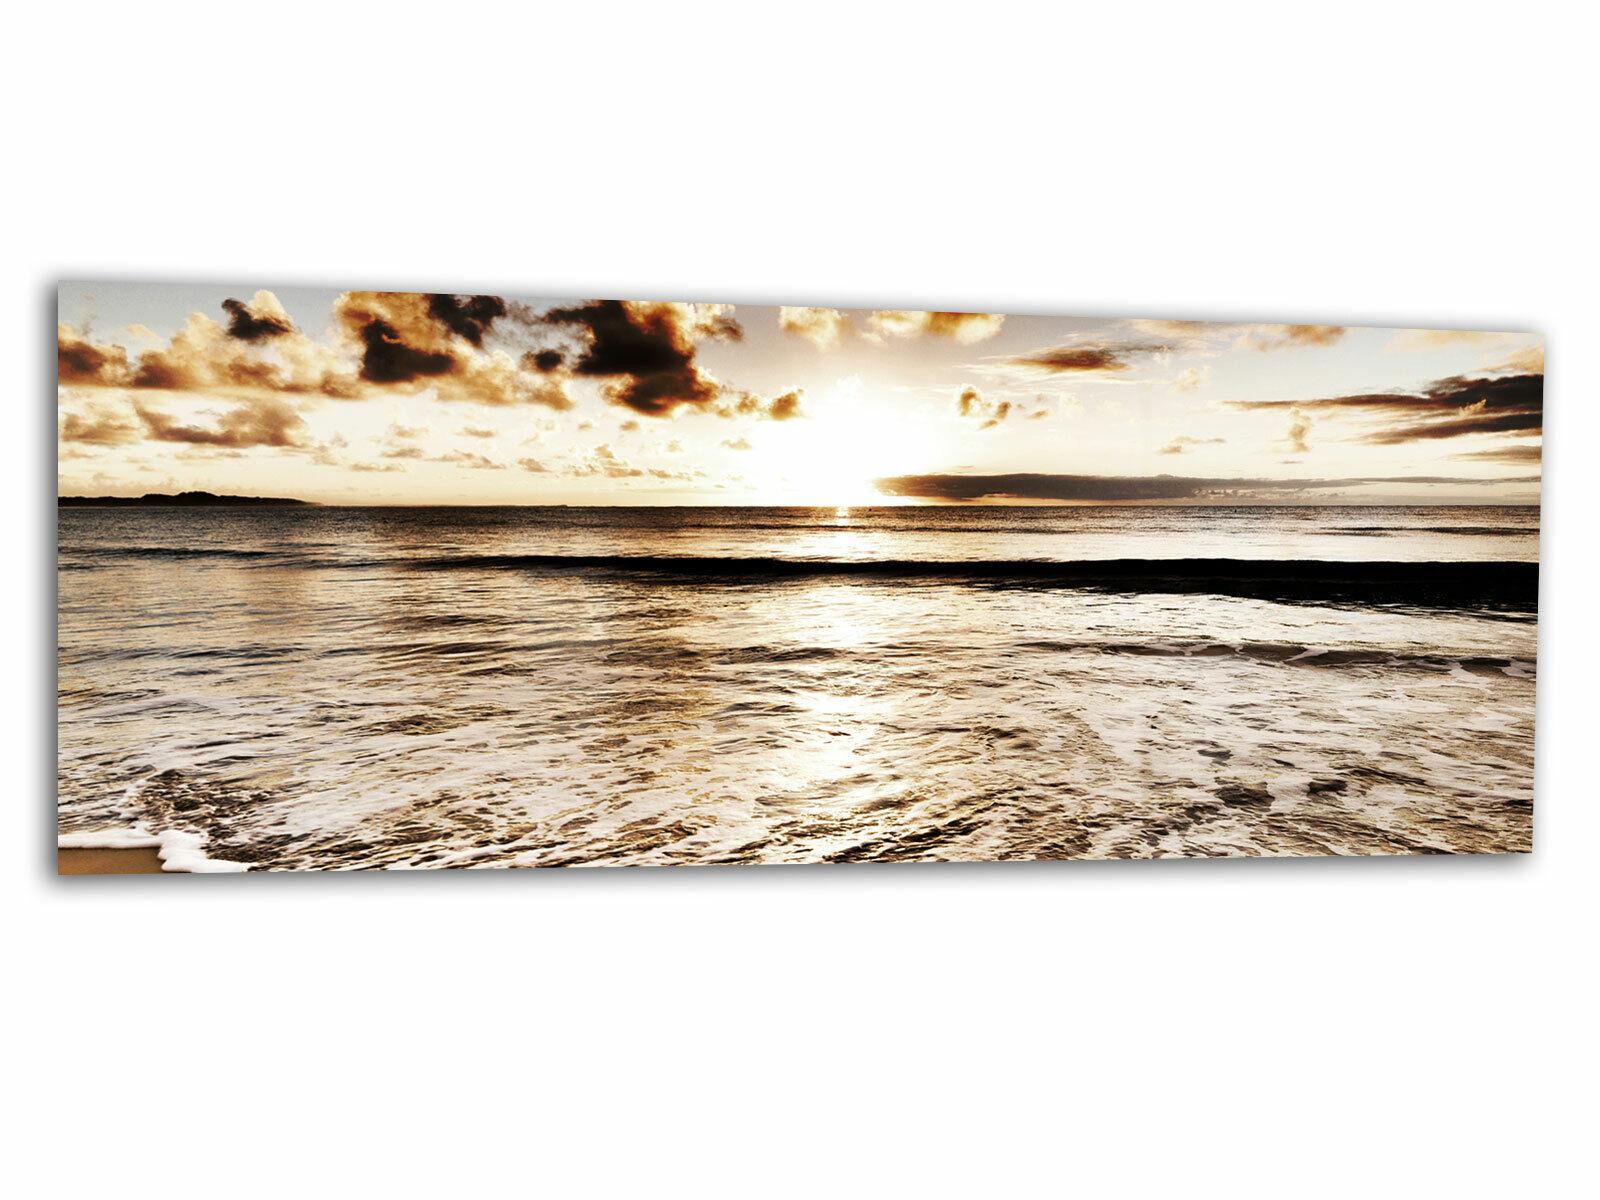 Glas-Bild Wandbild LANDSCHAFT MEER II AG-01135 125 x 50cm